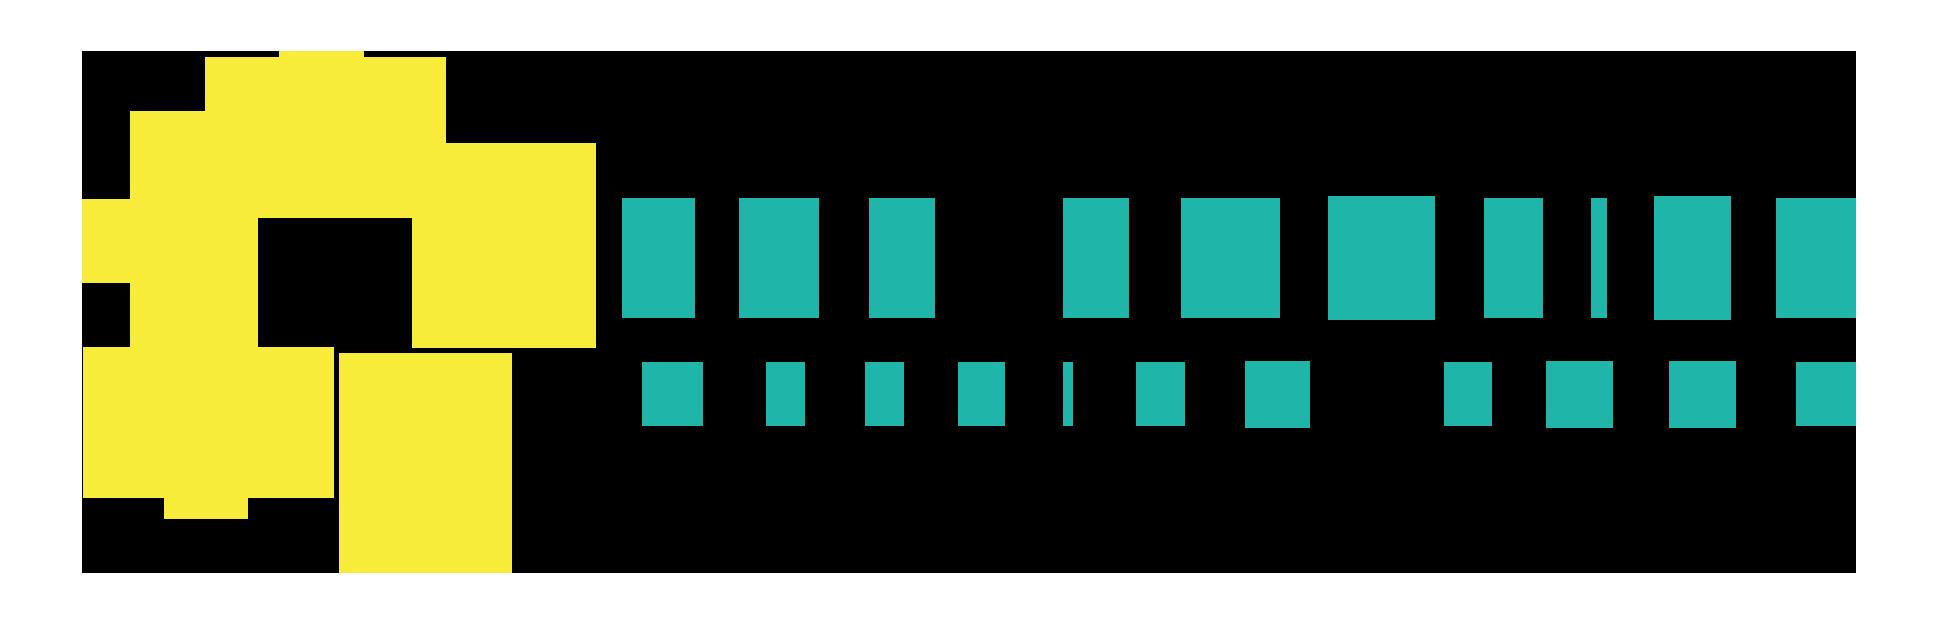 The English Meeting Room's logo. The full, horizontal version.